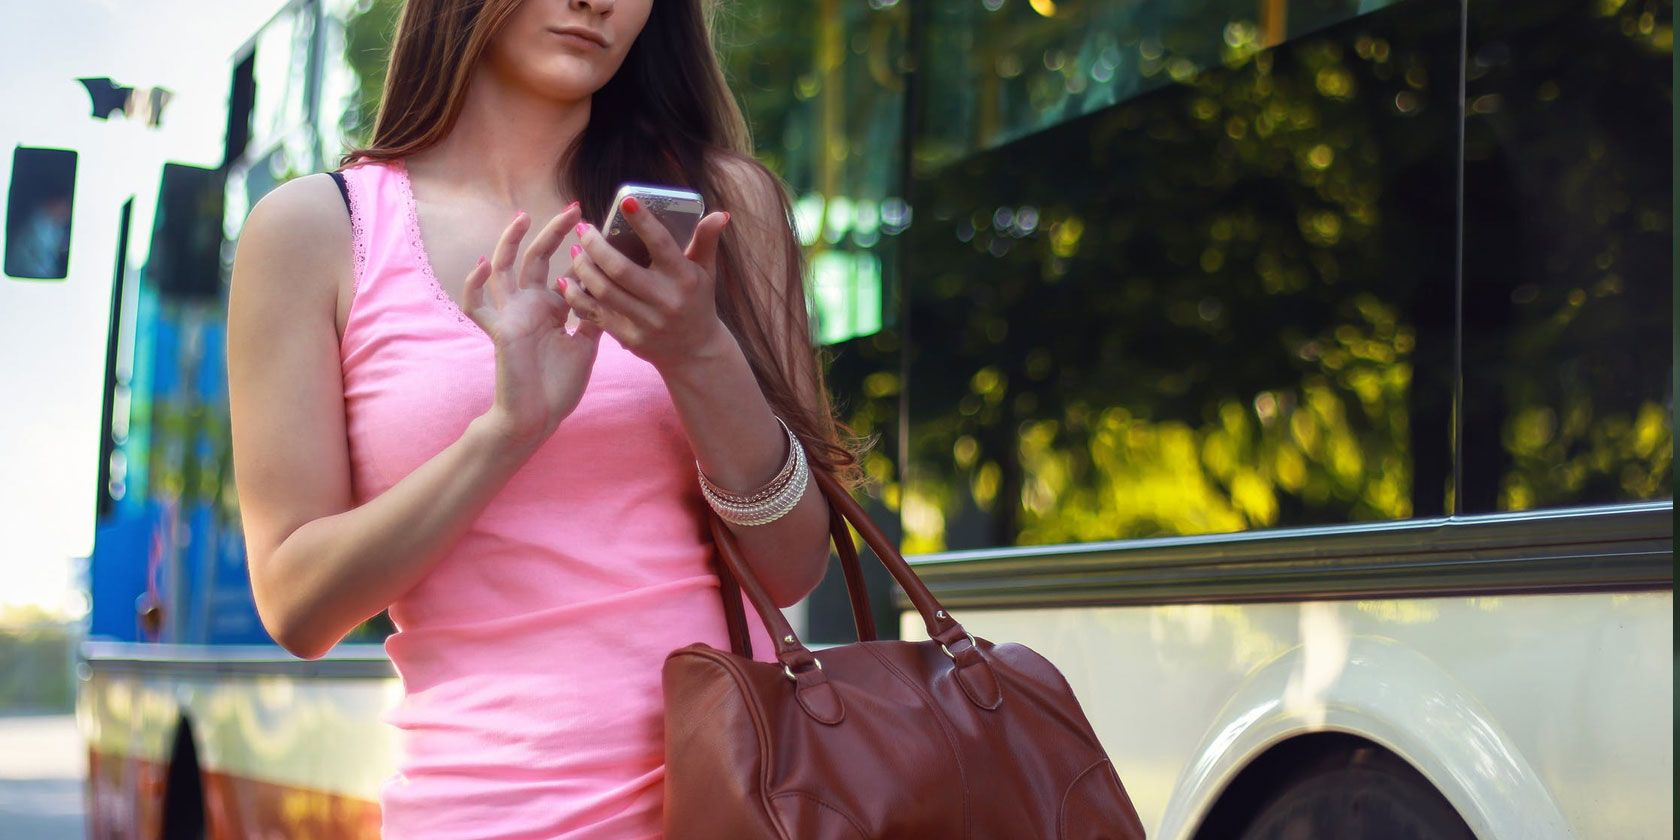 texting-and-walking